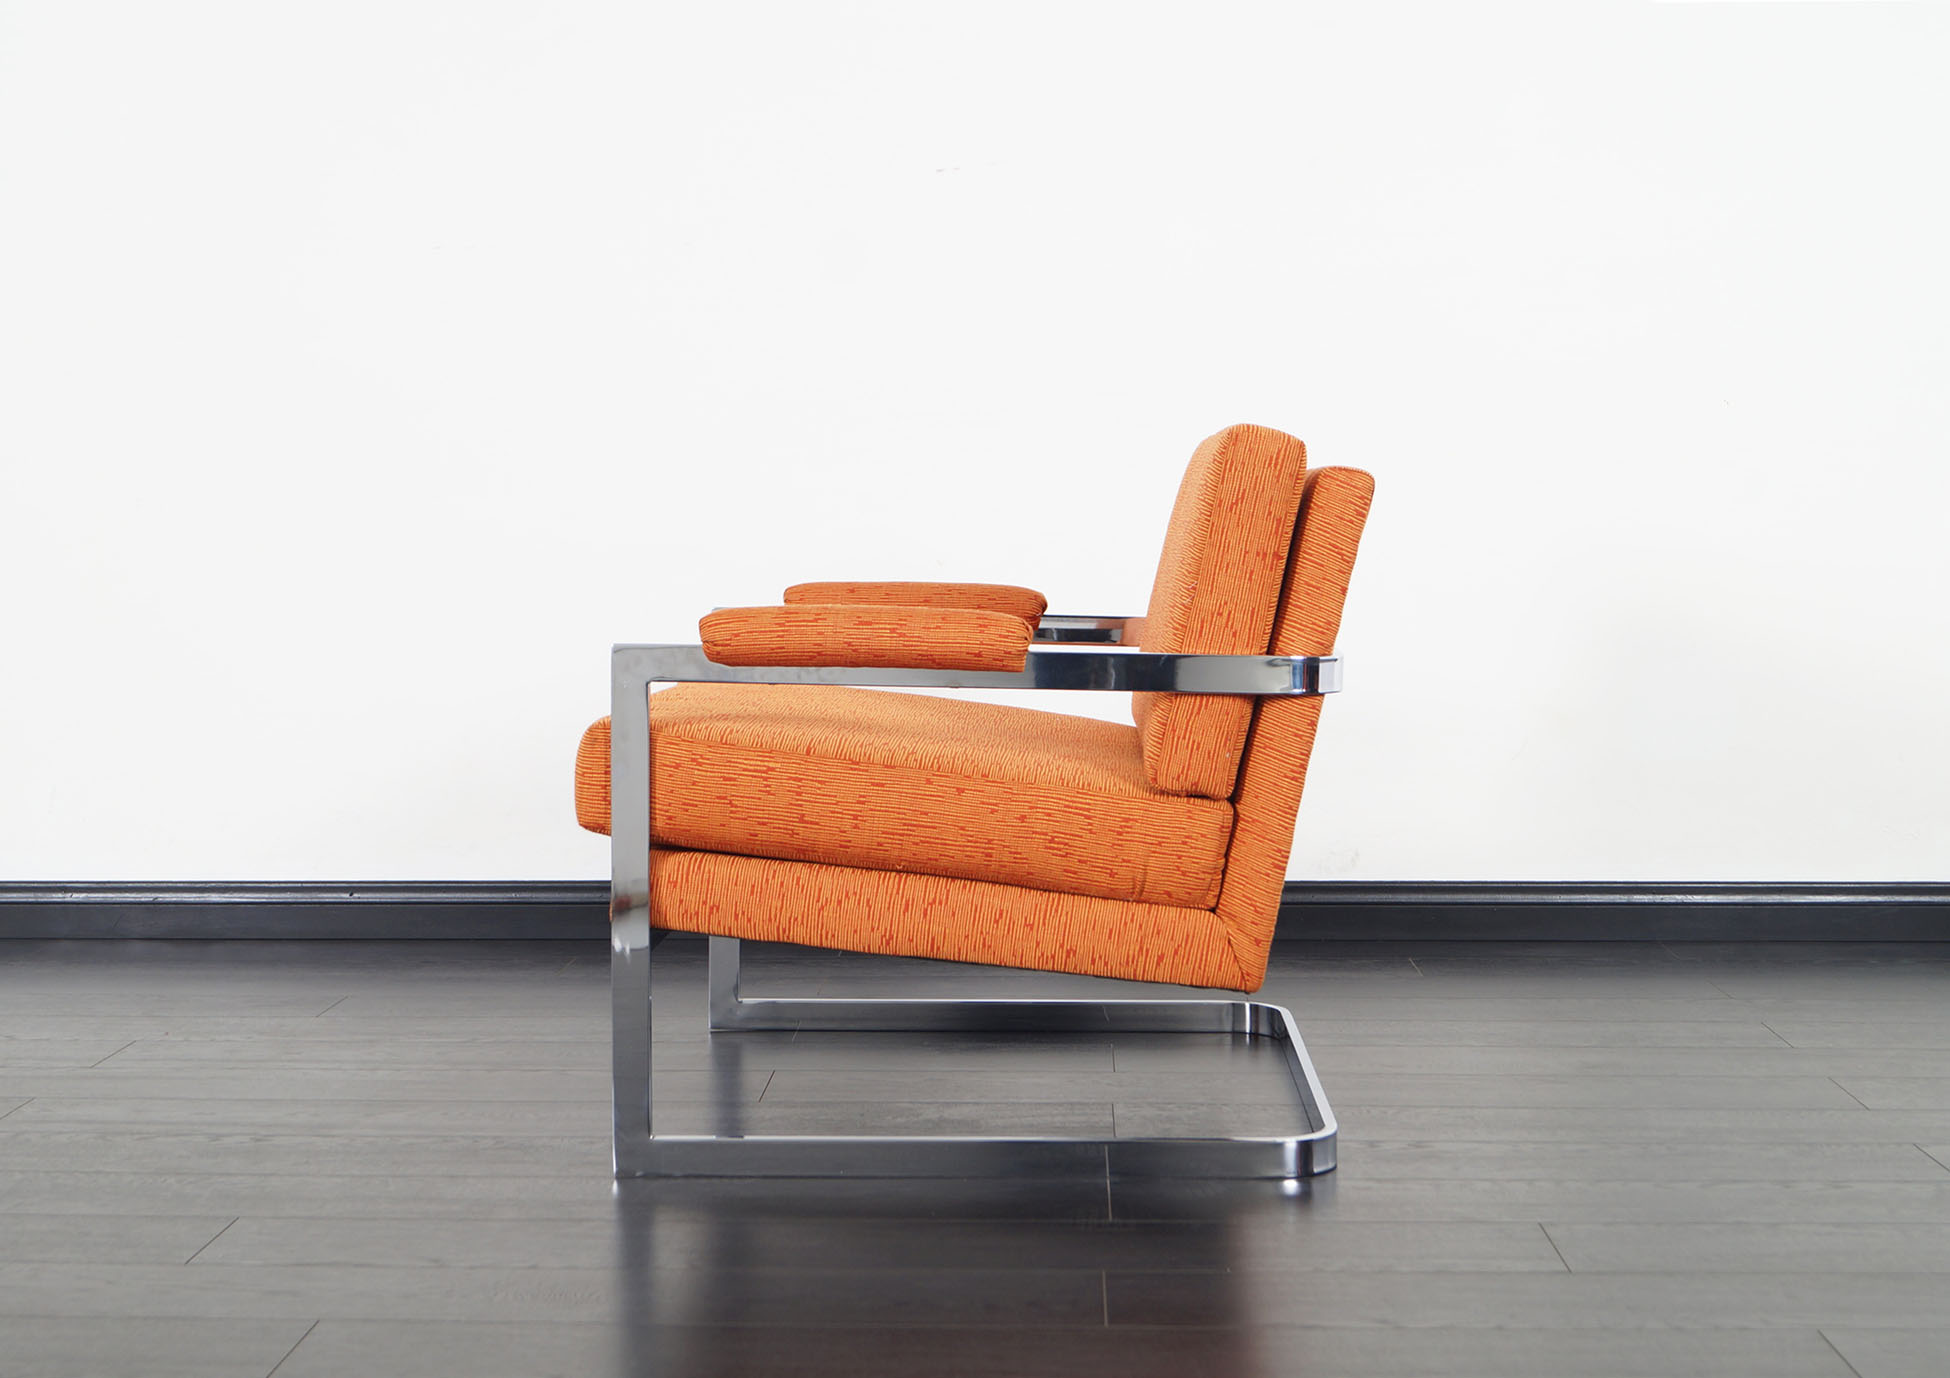 Vintage Chrome Lounge Chairs